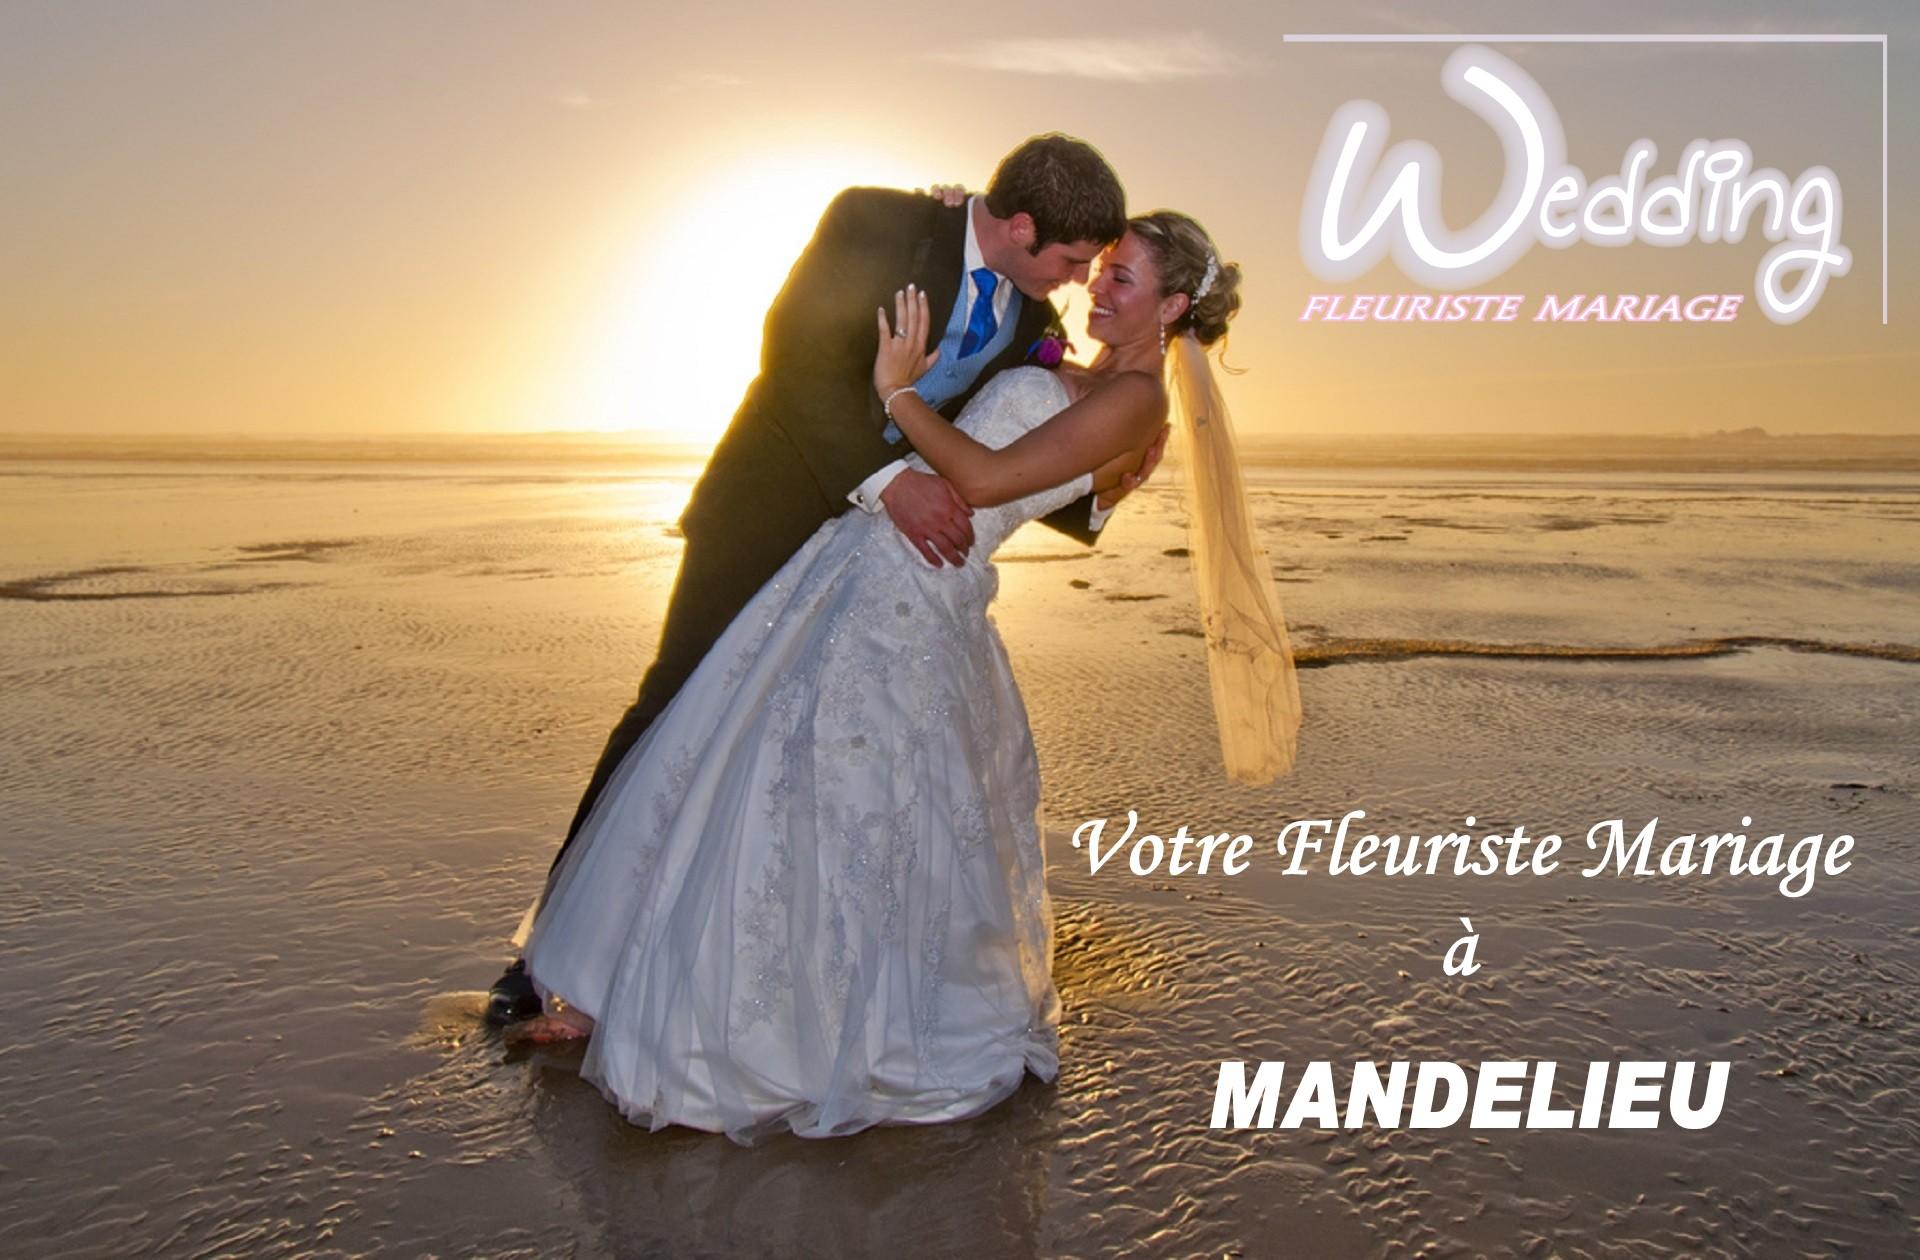 FLEURISTE MARIAGE MANDELIEU - WEDDING PLANNER MANDELIEU - TRAITEUR MANDELIEU